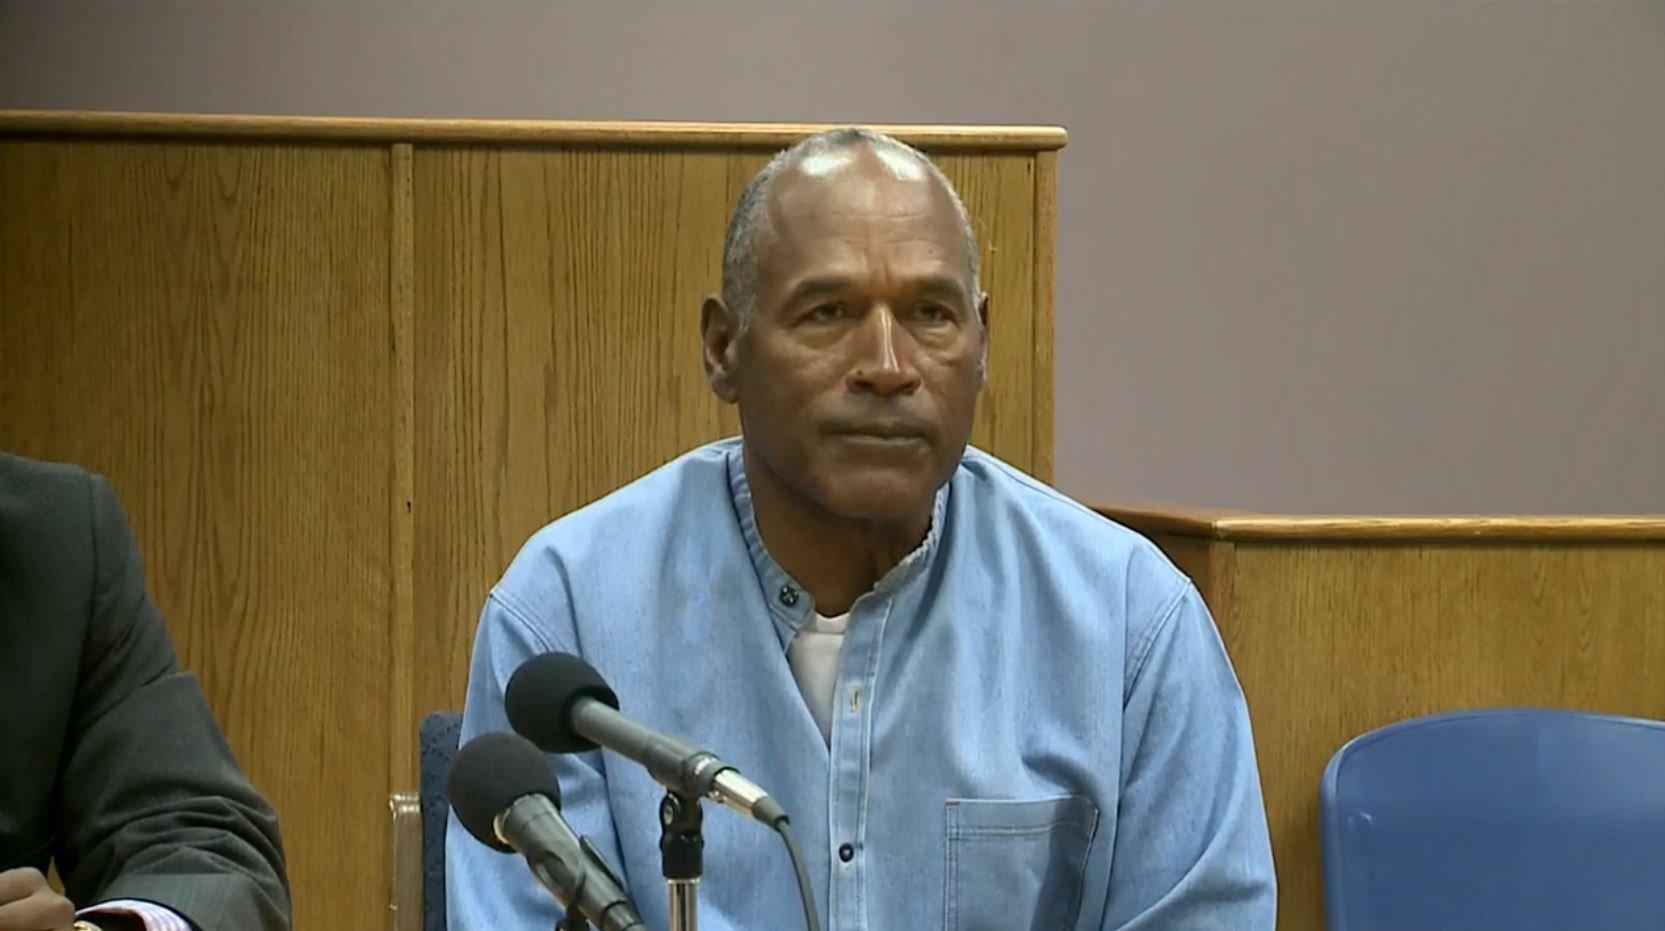 OJ Simpson granted parole in Las Vegas robbery case